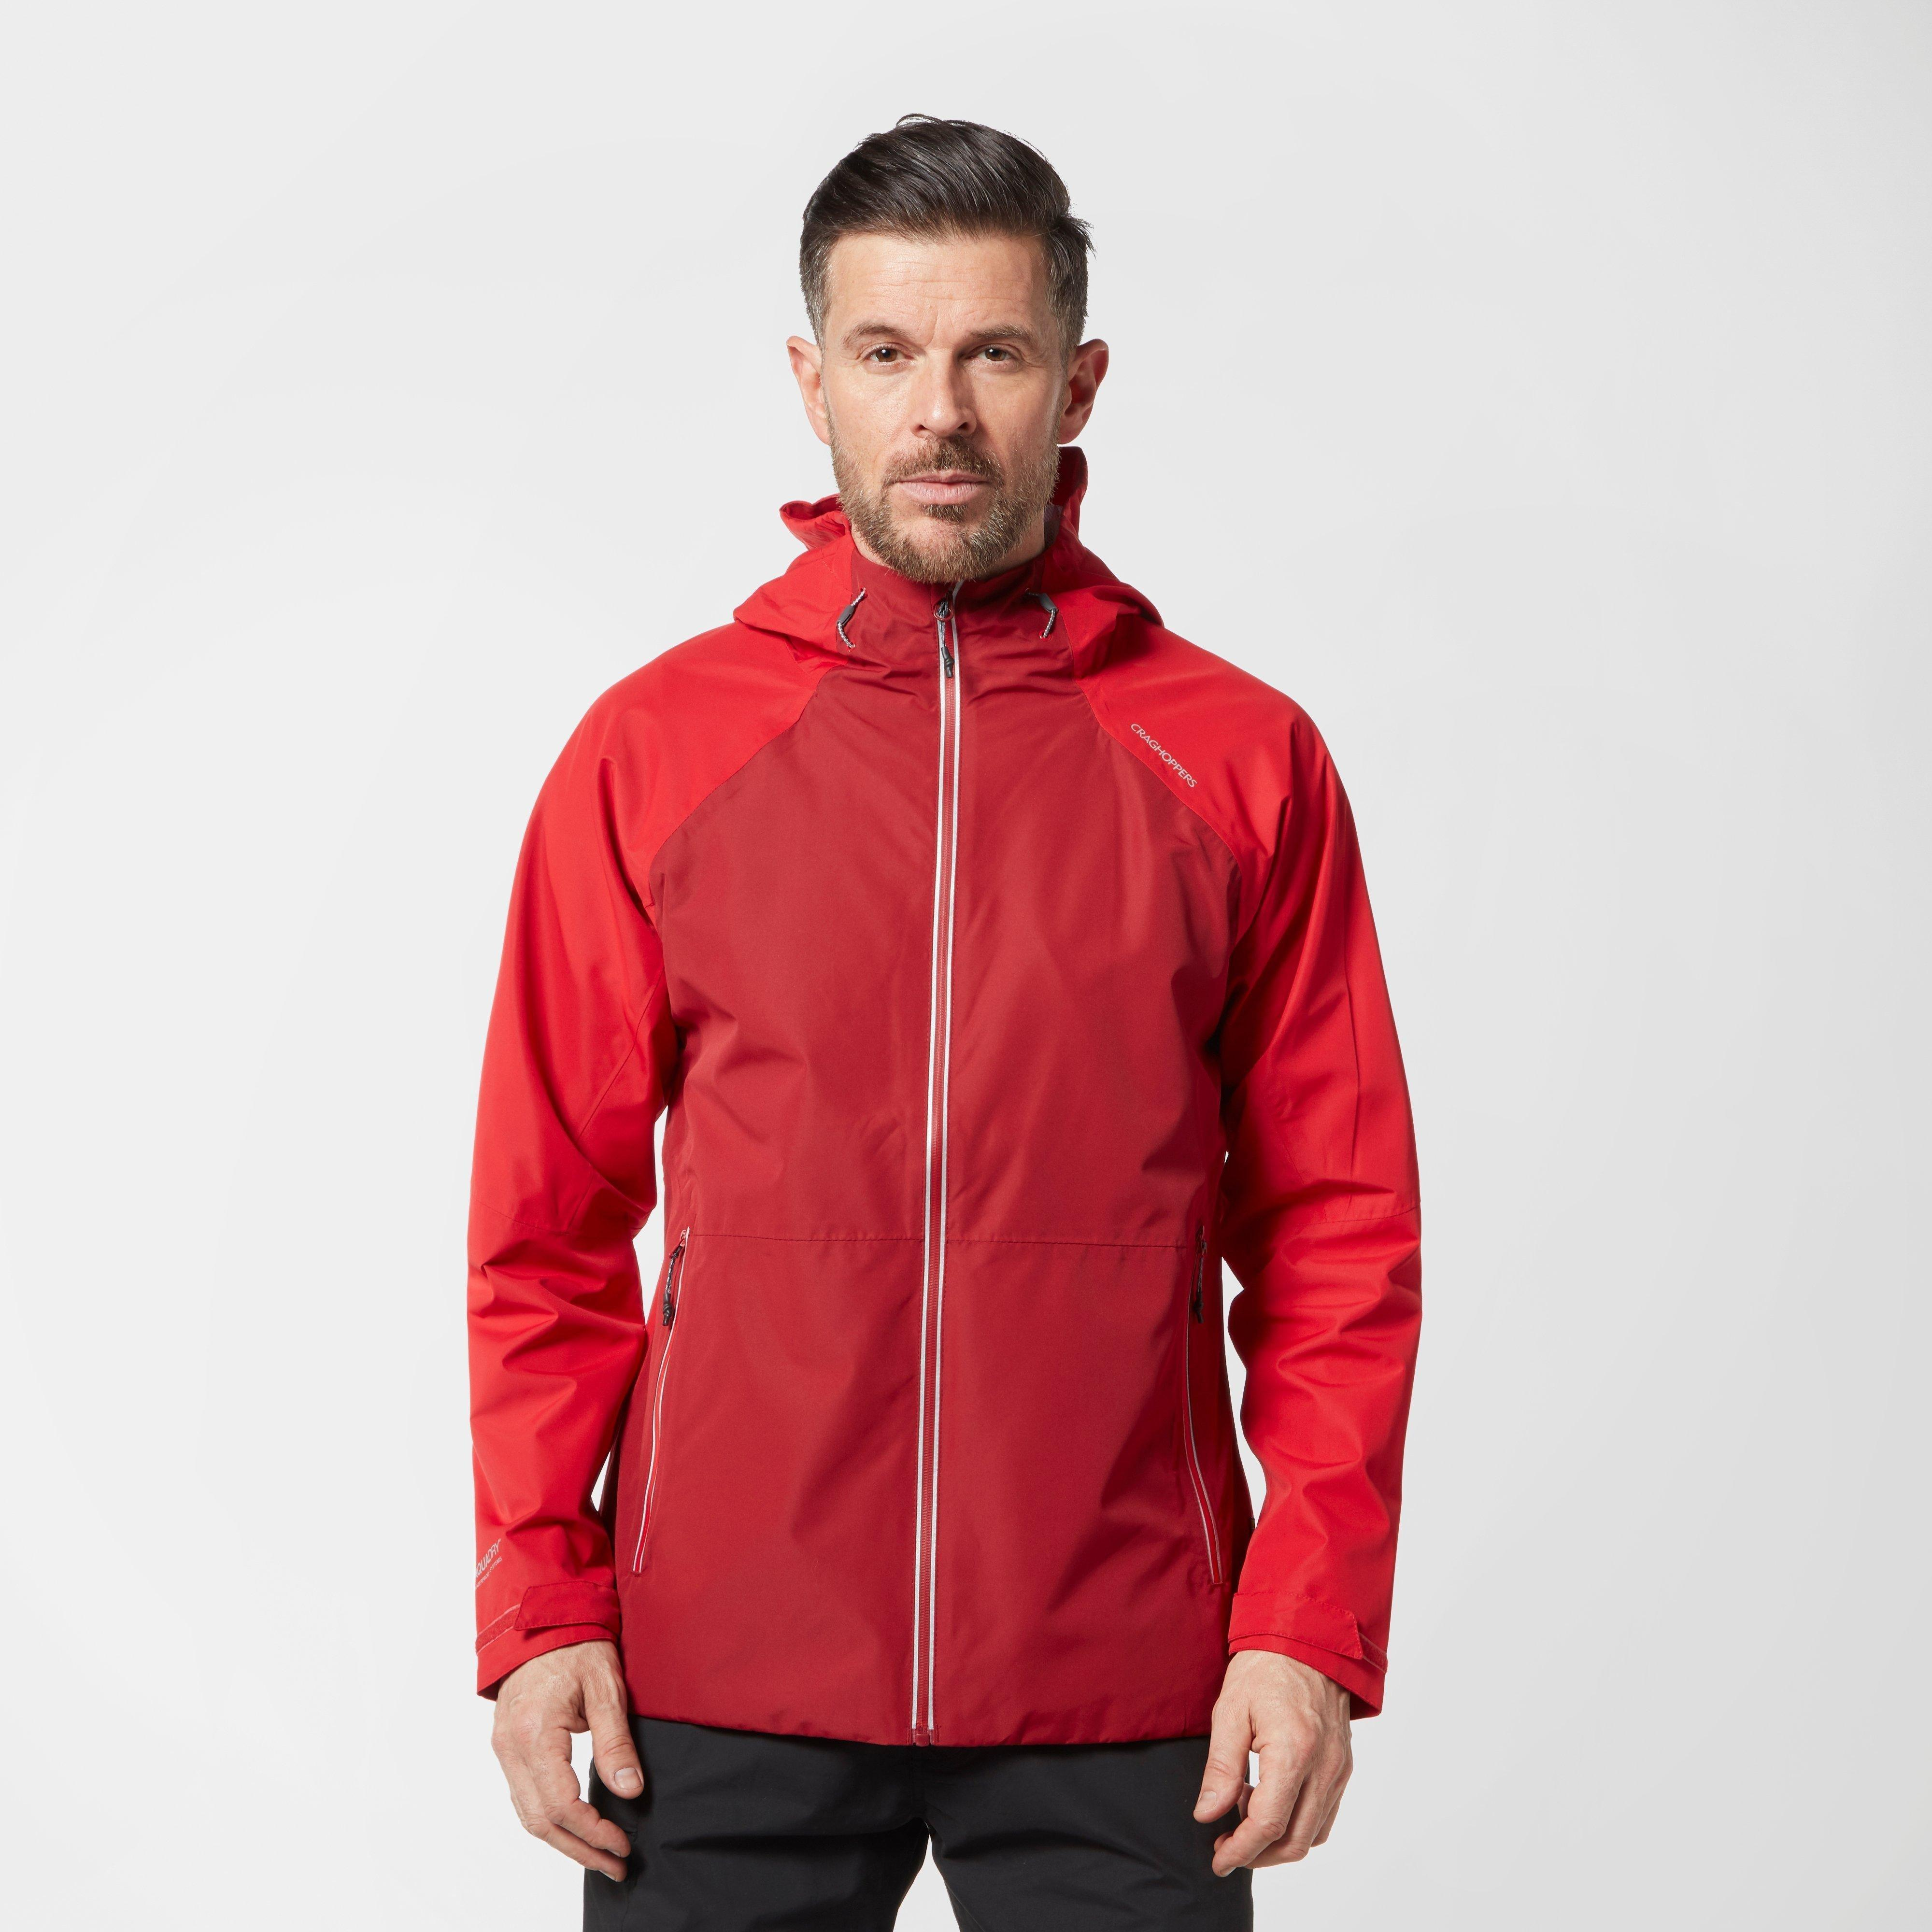 Craghoppers Men's Horizon Jacket - Red, Red